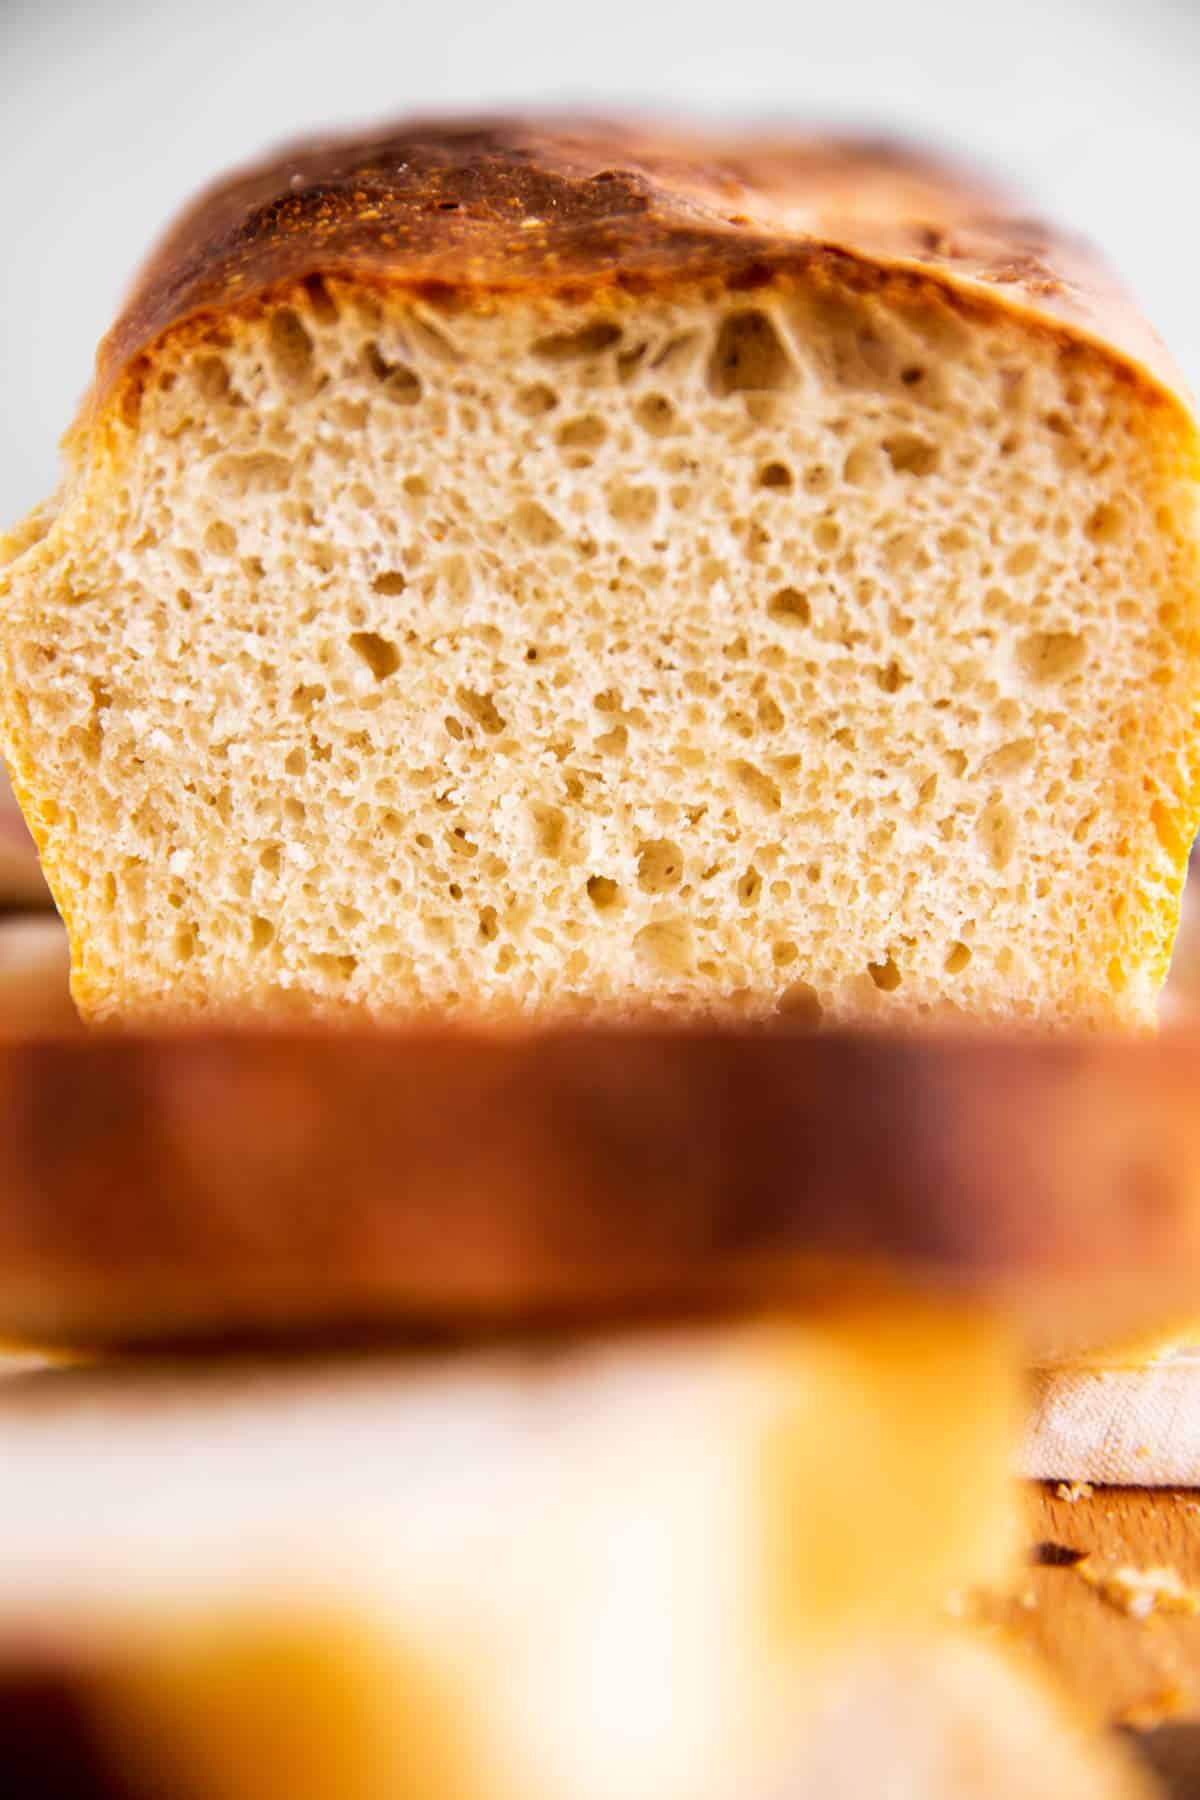 close up photo of sliced sourdough bread